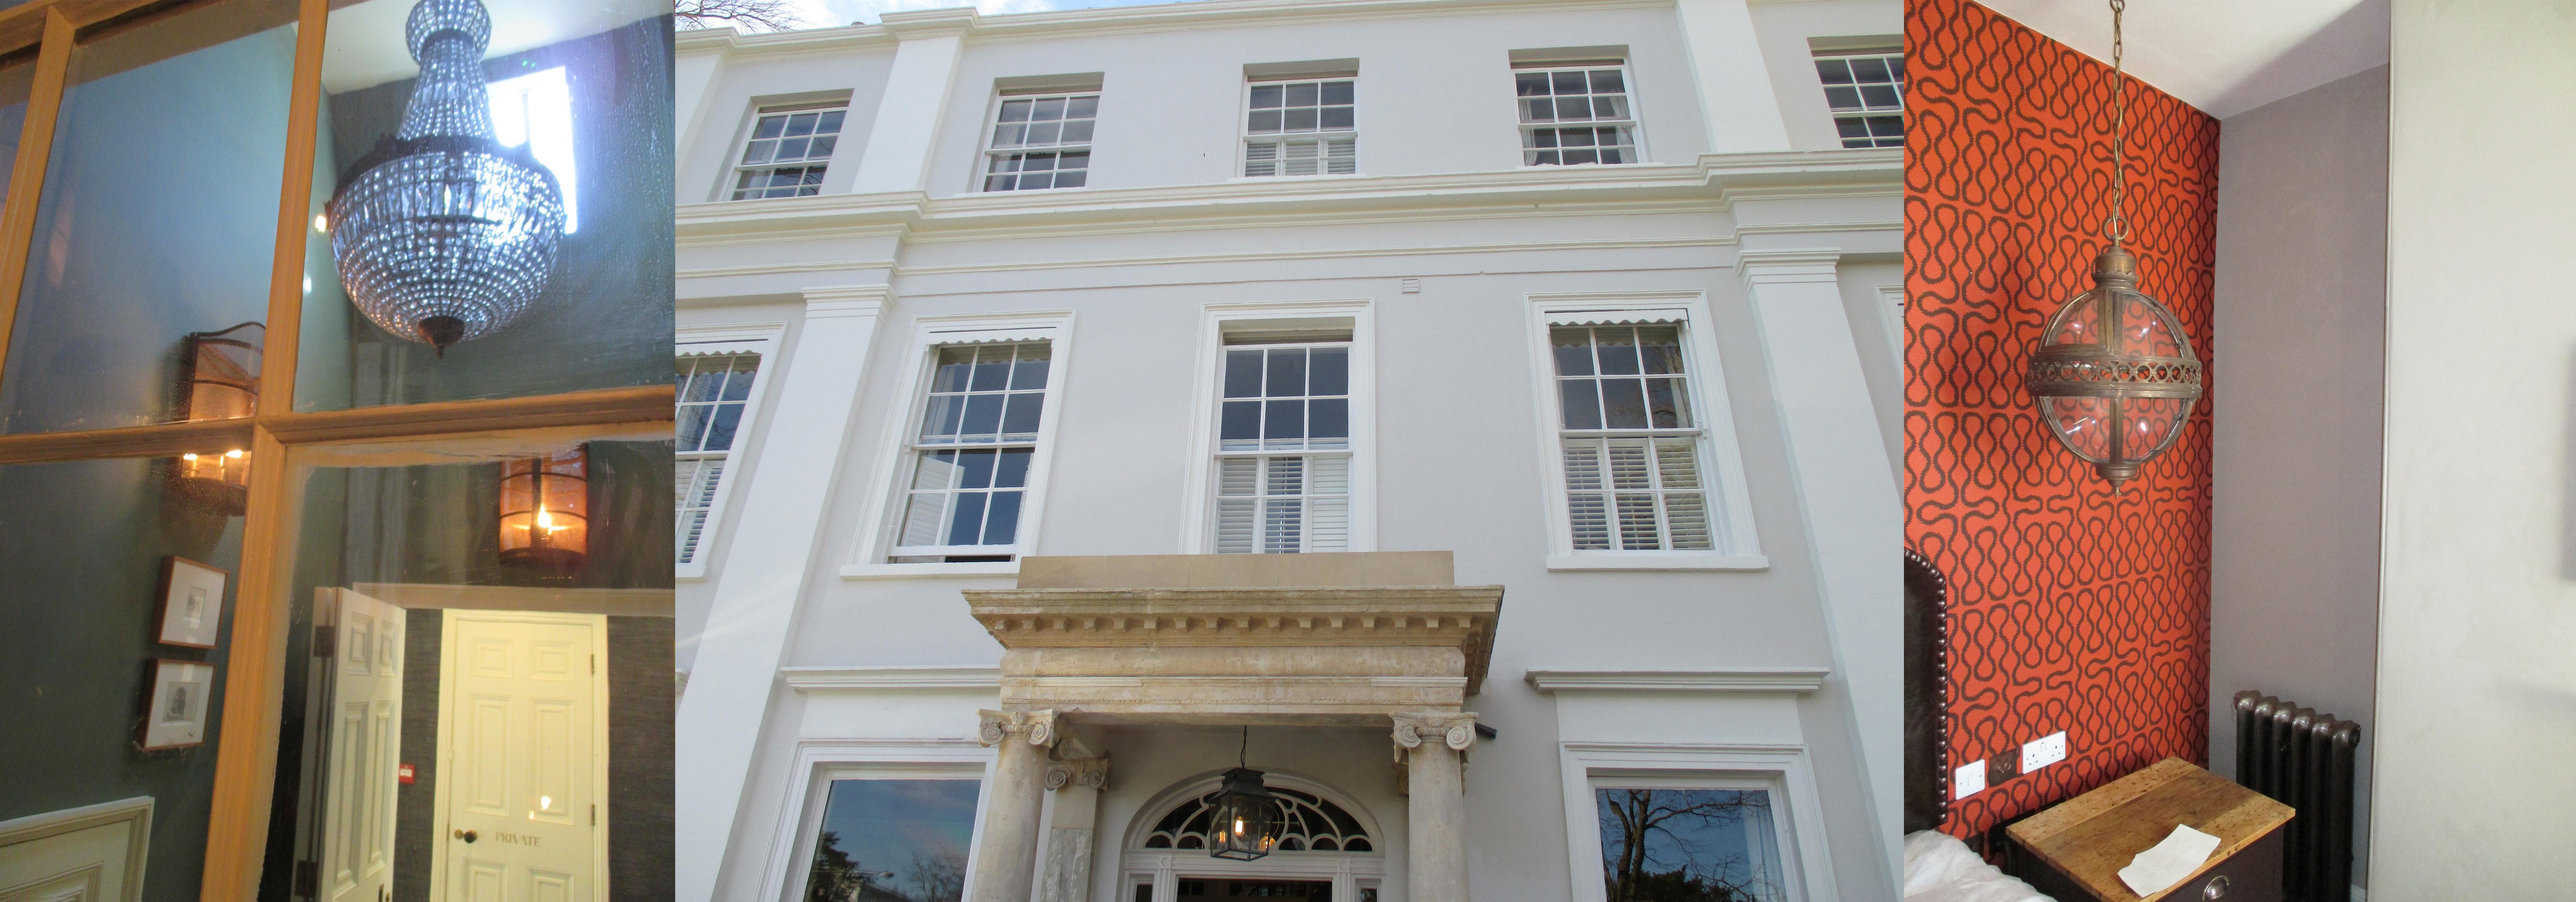 S g bailey paints ltd case studies for Farrow and ball exterior paint reviews